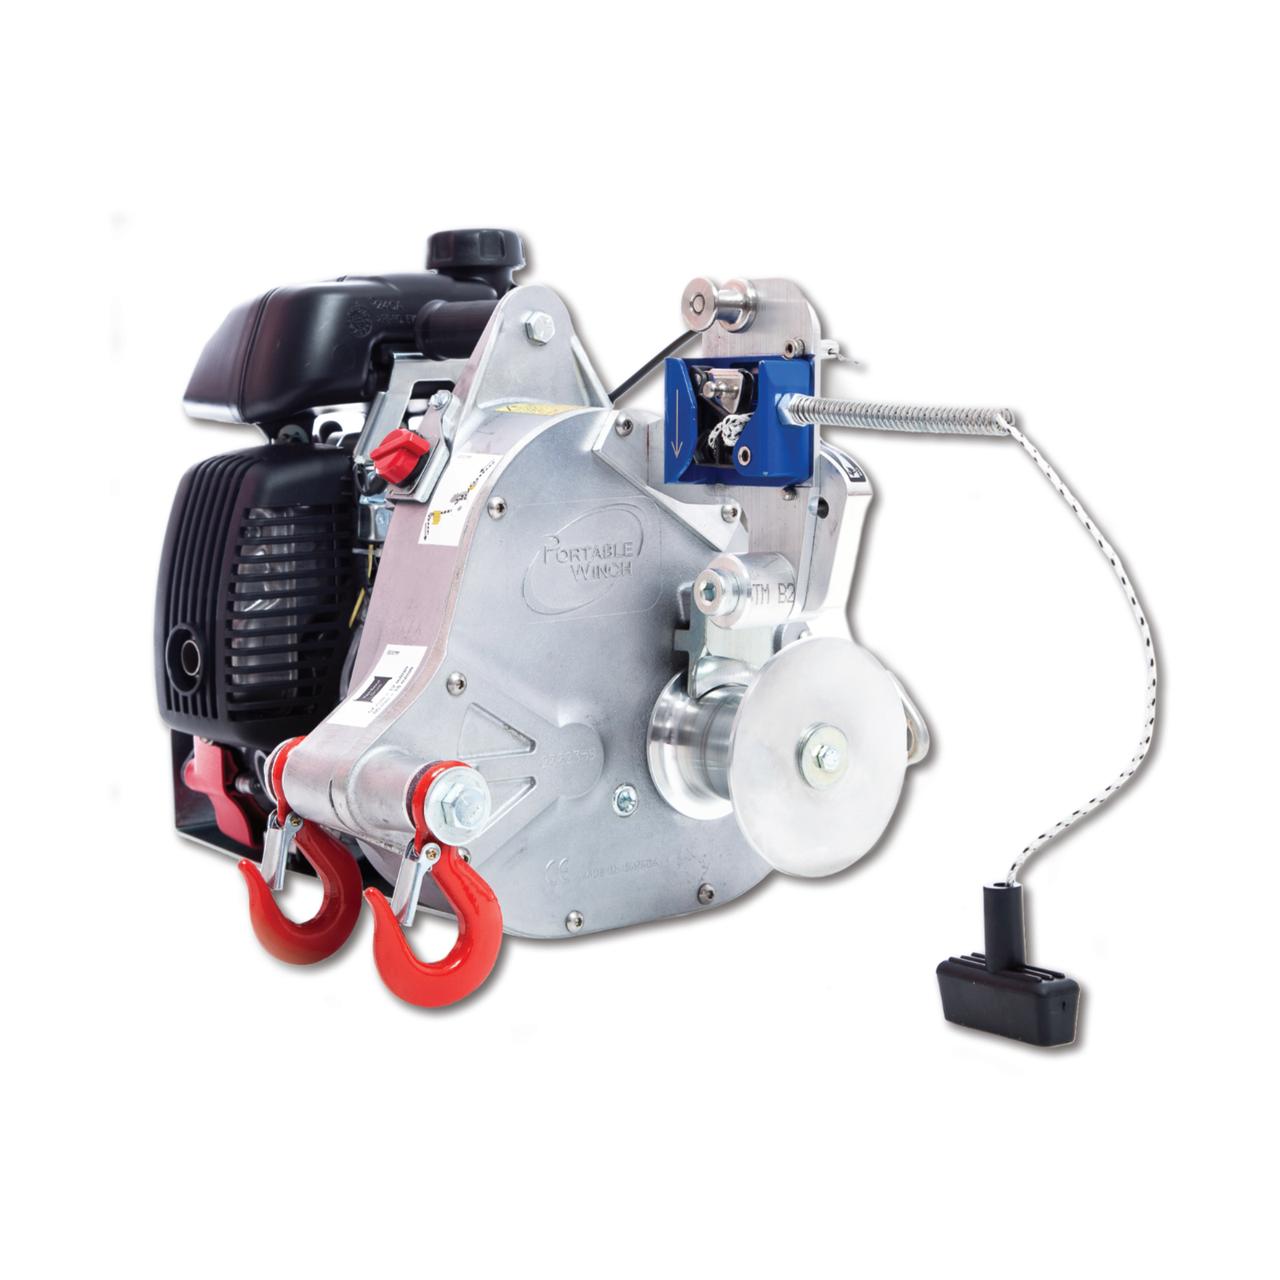 Portable Winch PCH-1000 Лебедка бензиновая до 775 кг (комплектация MINI)